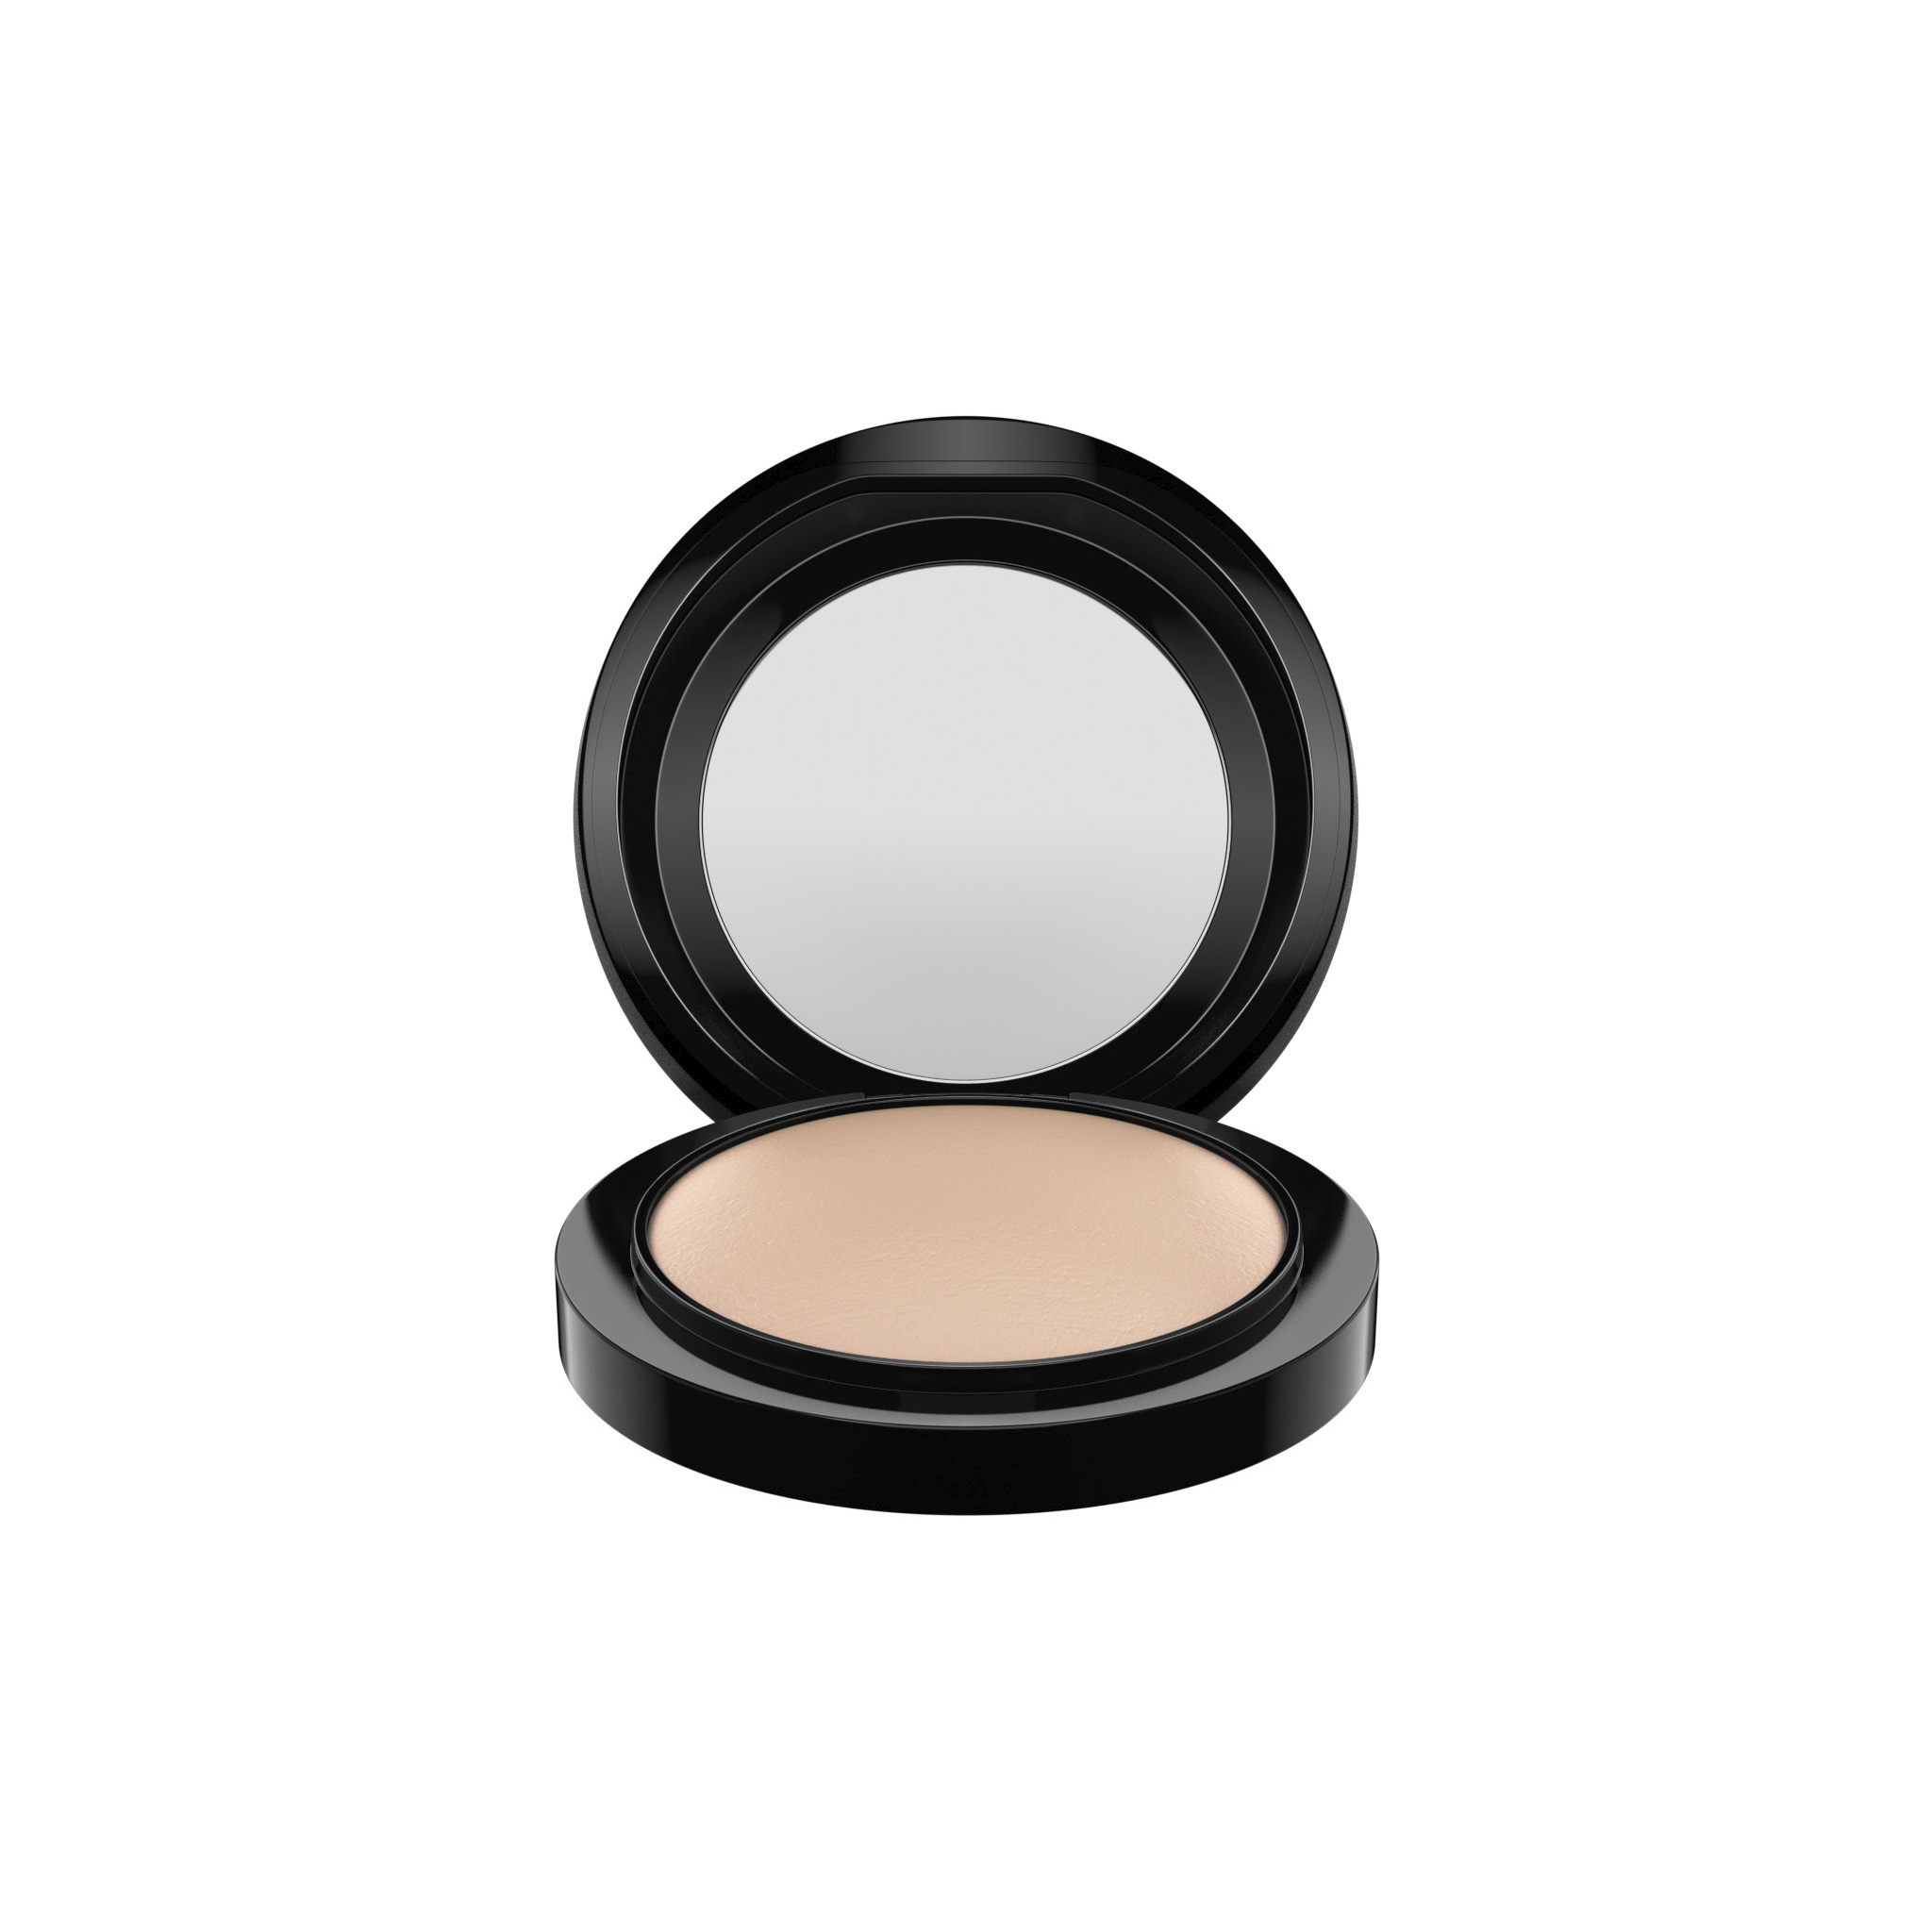 MAC Mineralize Skinfinish/Natural, medium plus